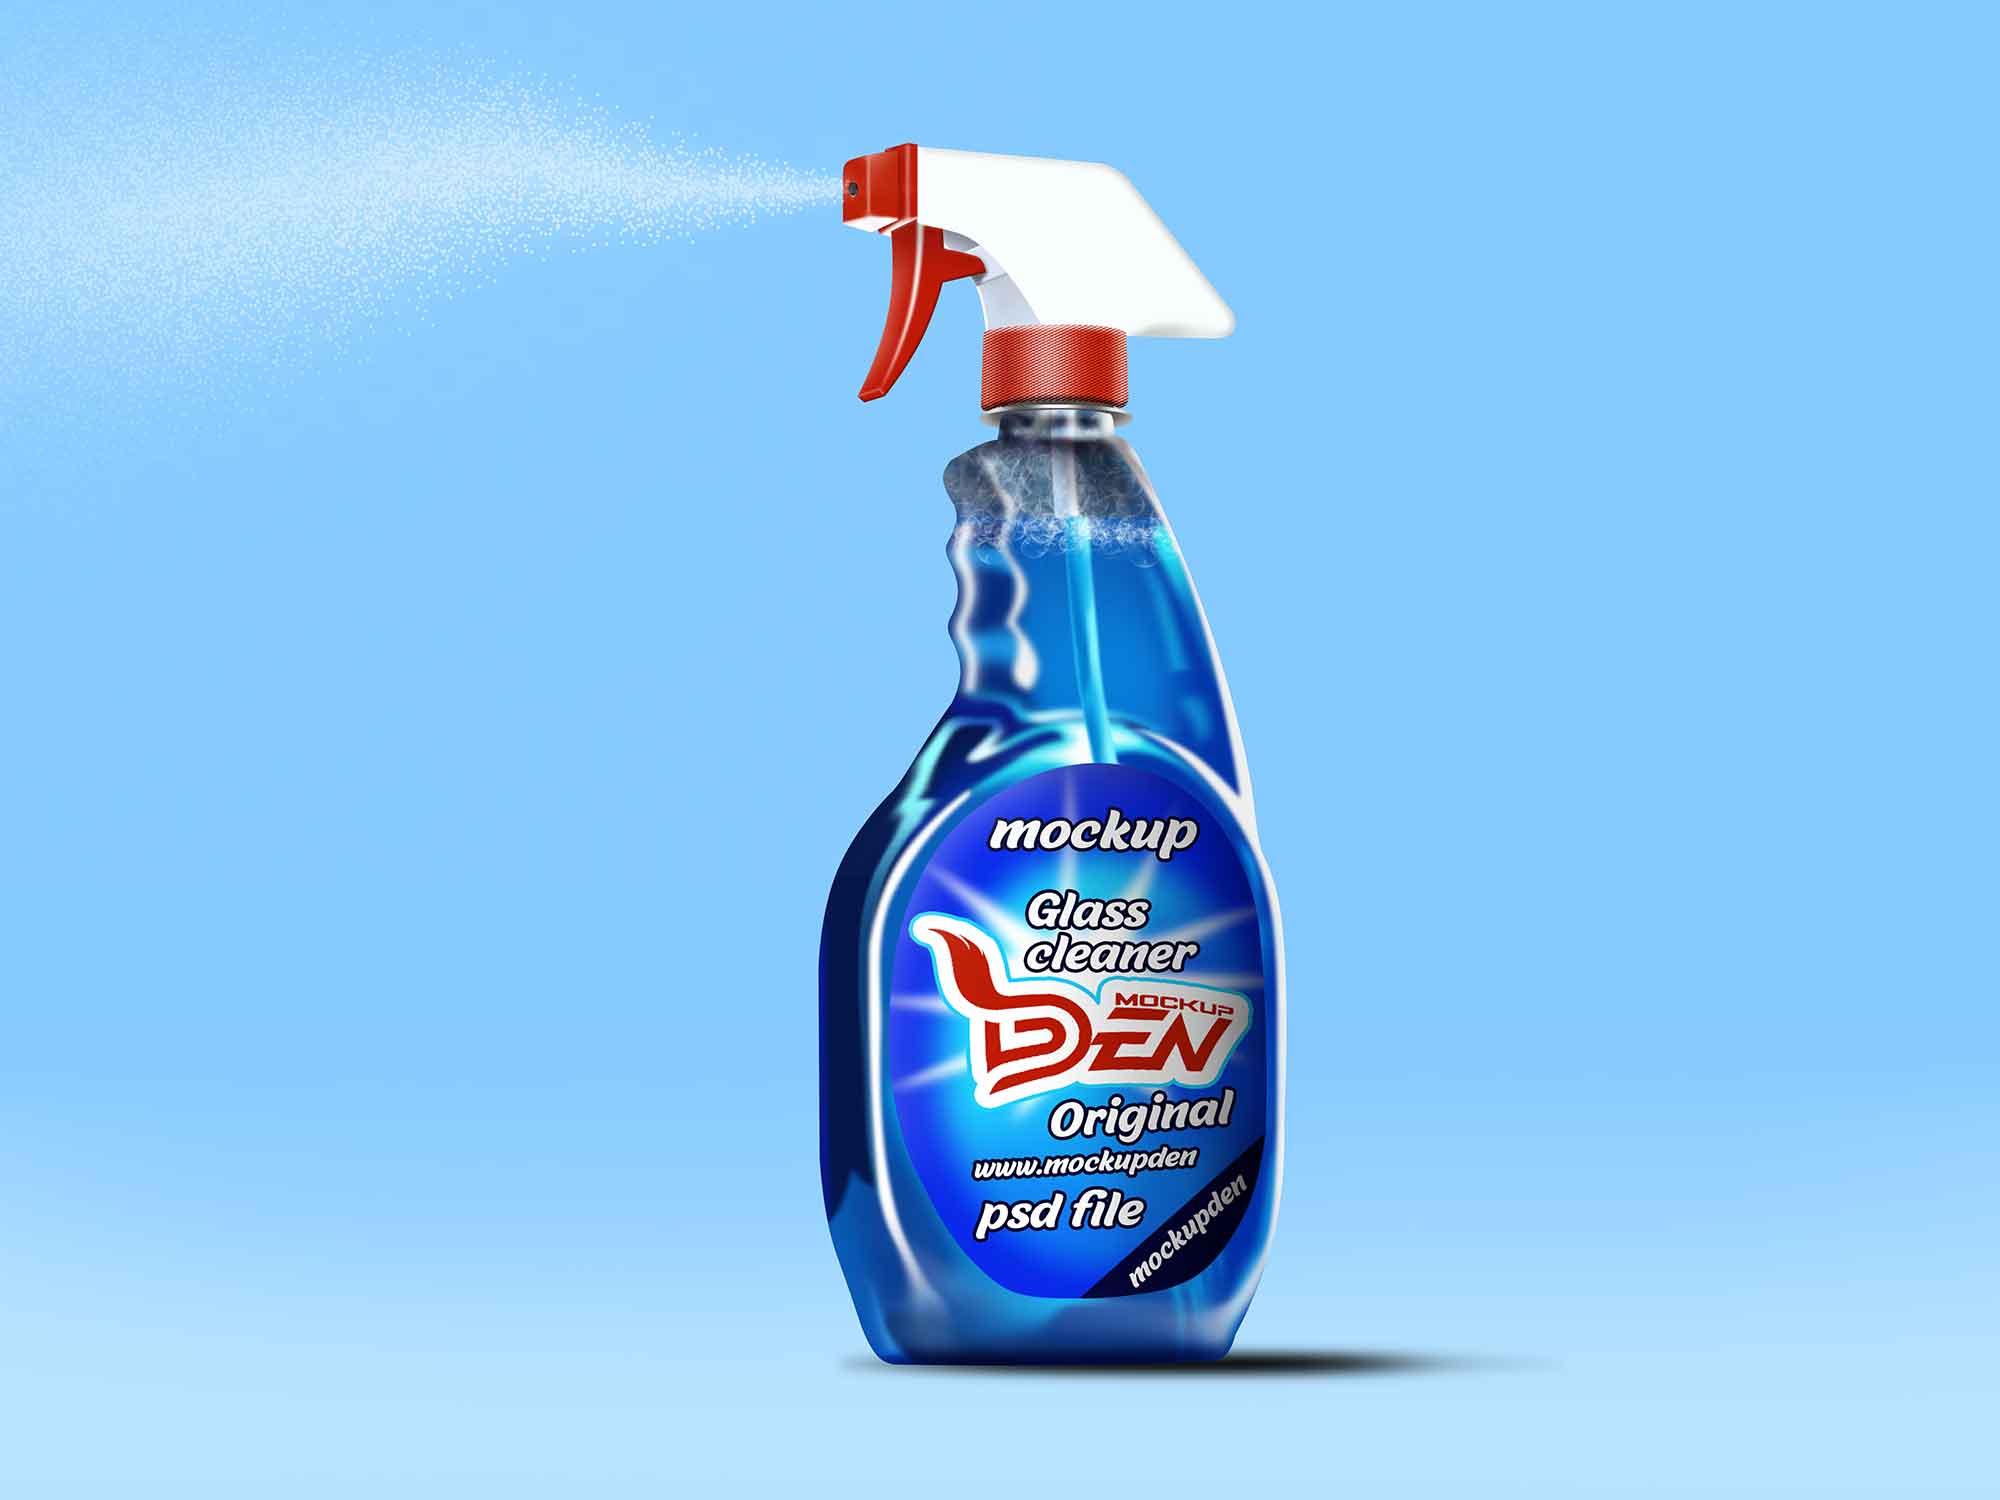 Glass Cleaner Spray Mockup